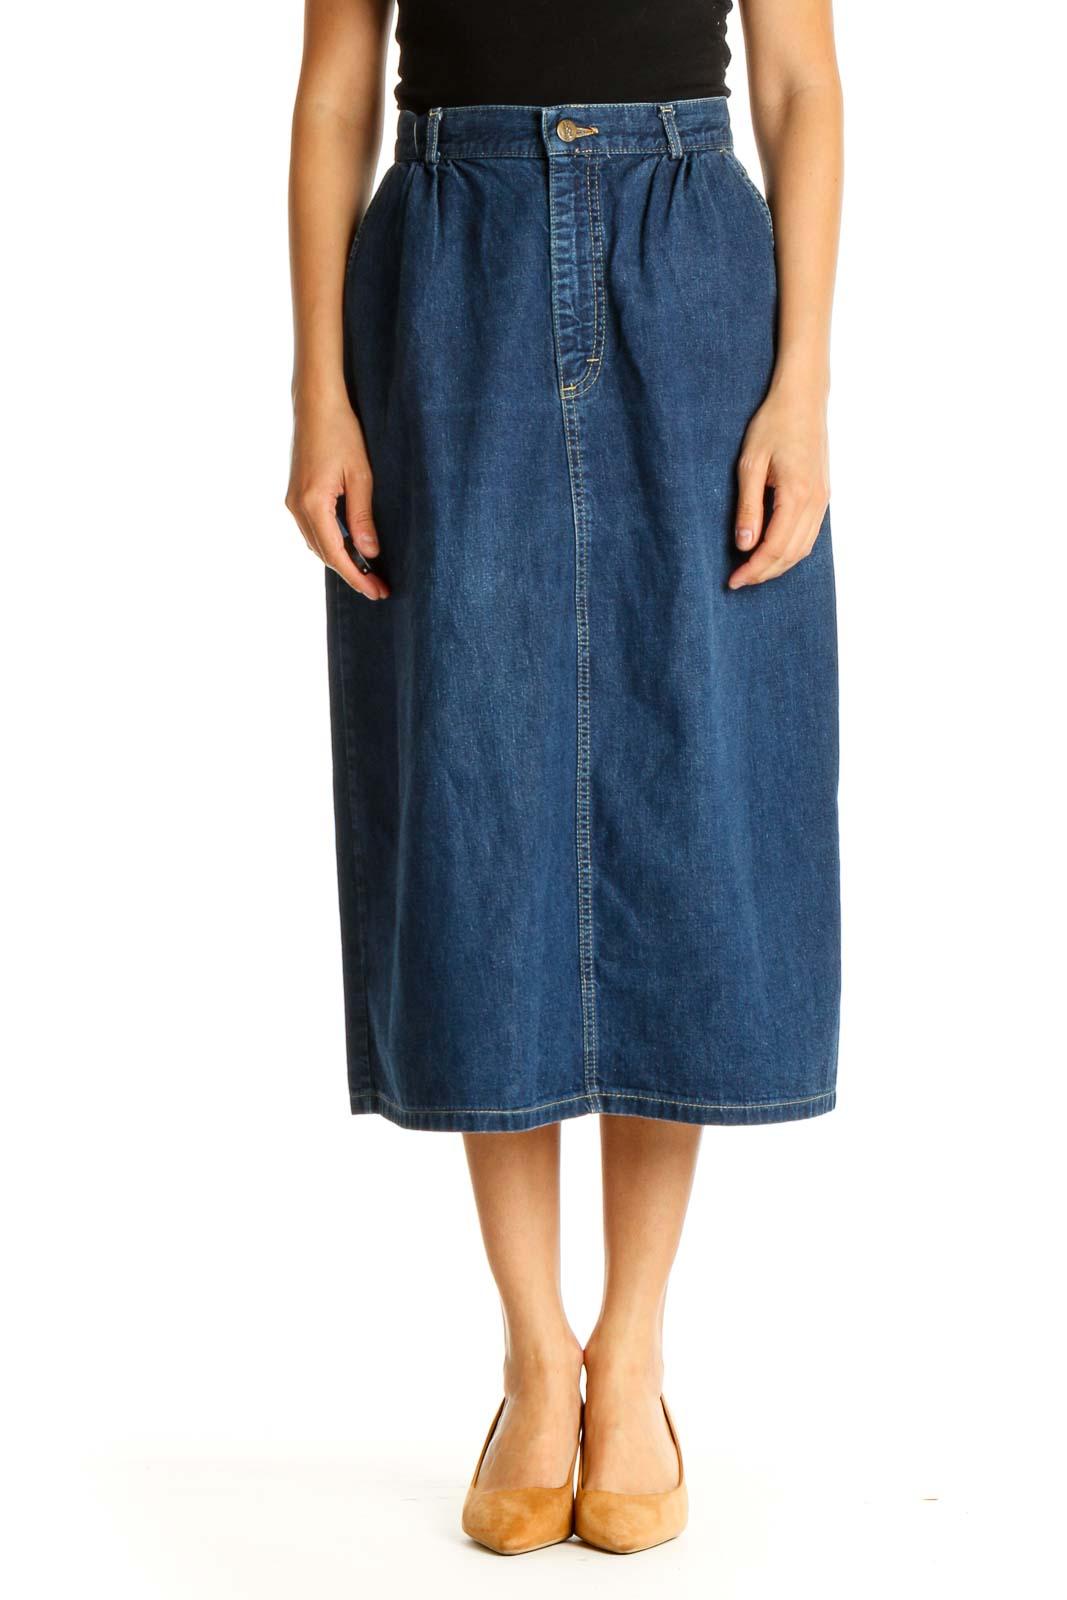 Blue Denim All Day Wear A-Line Skirt Front